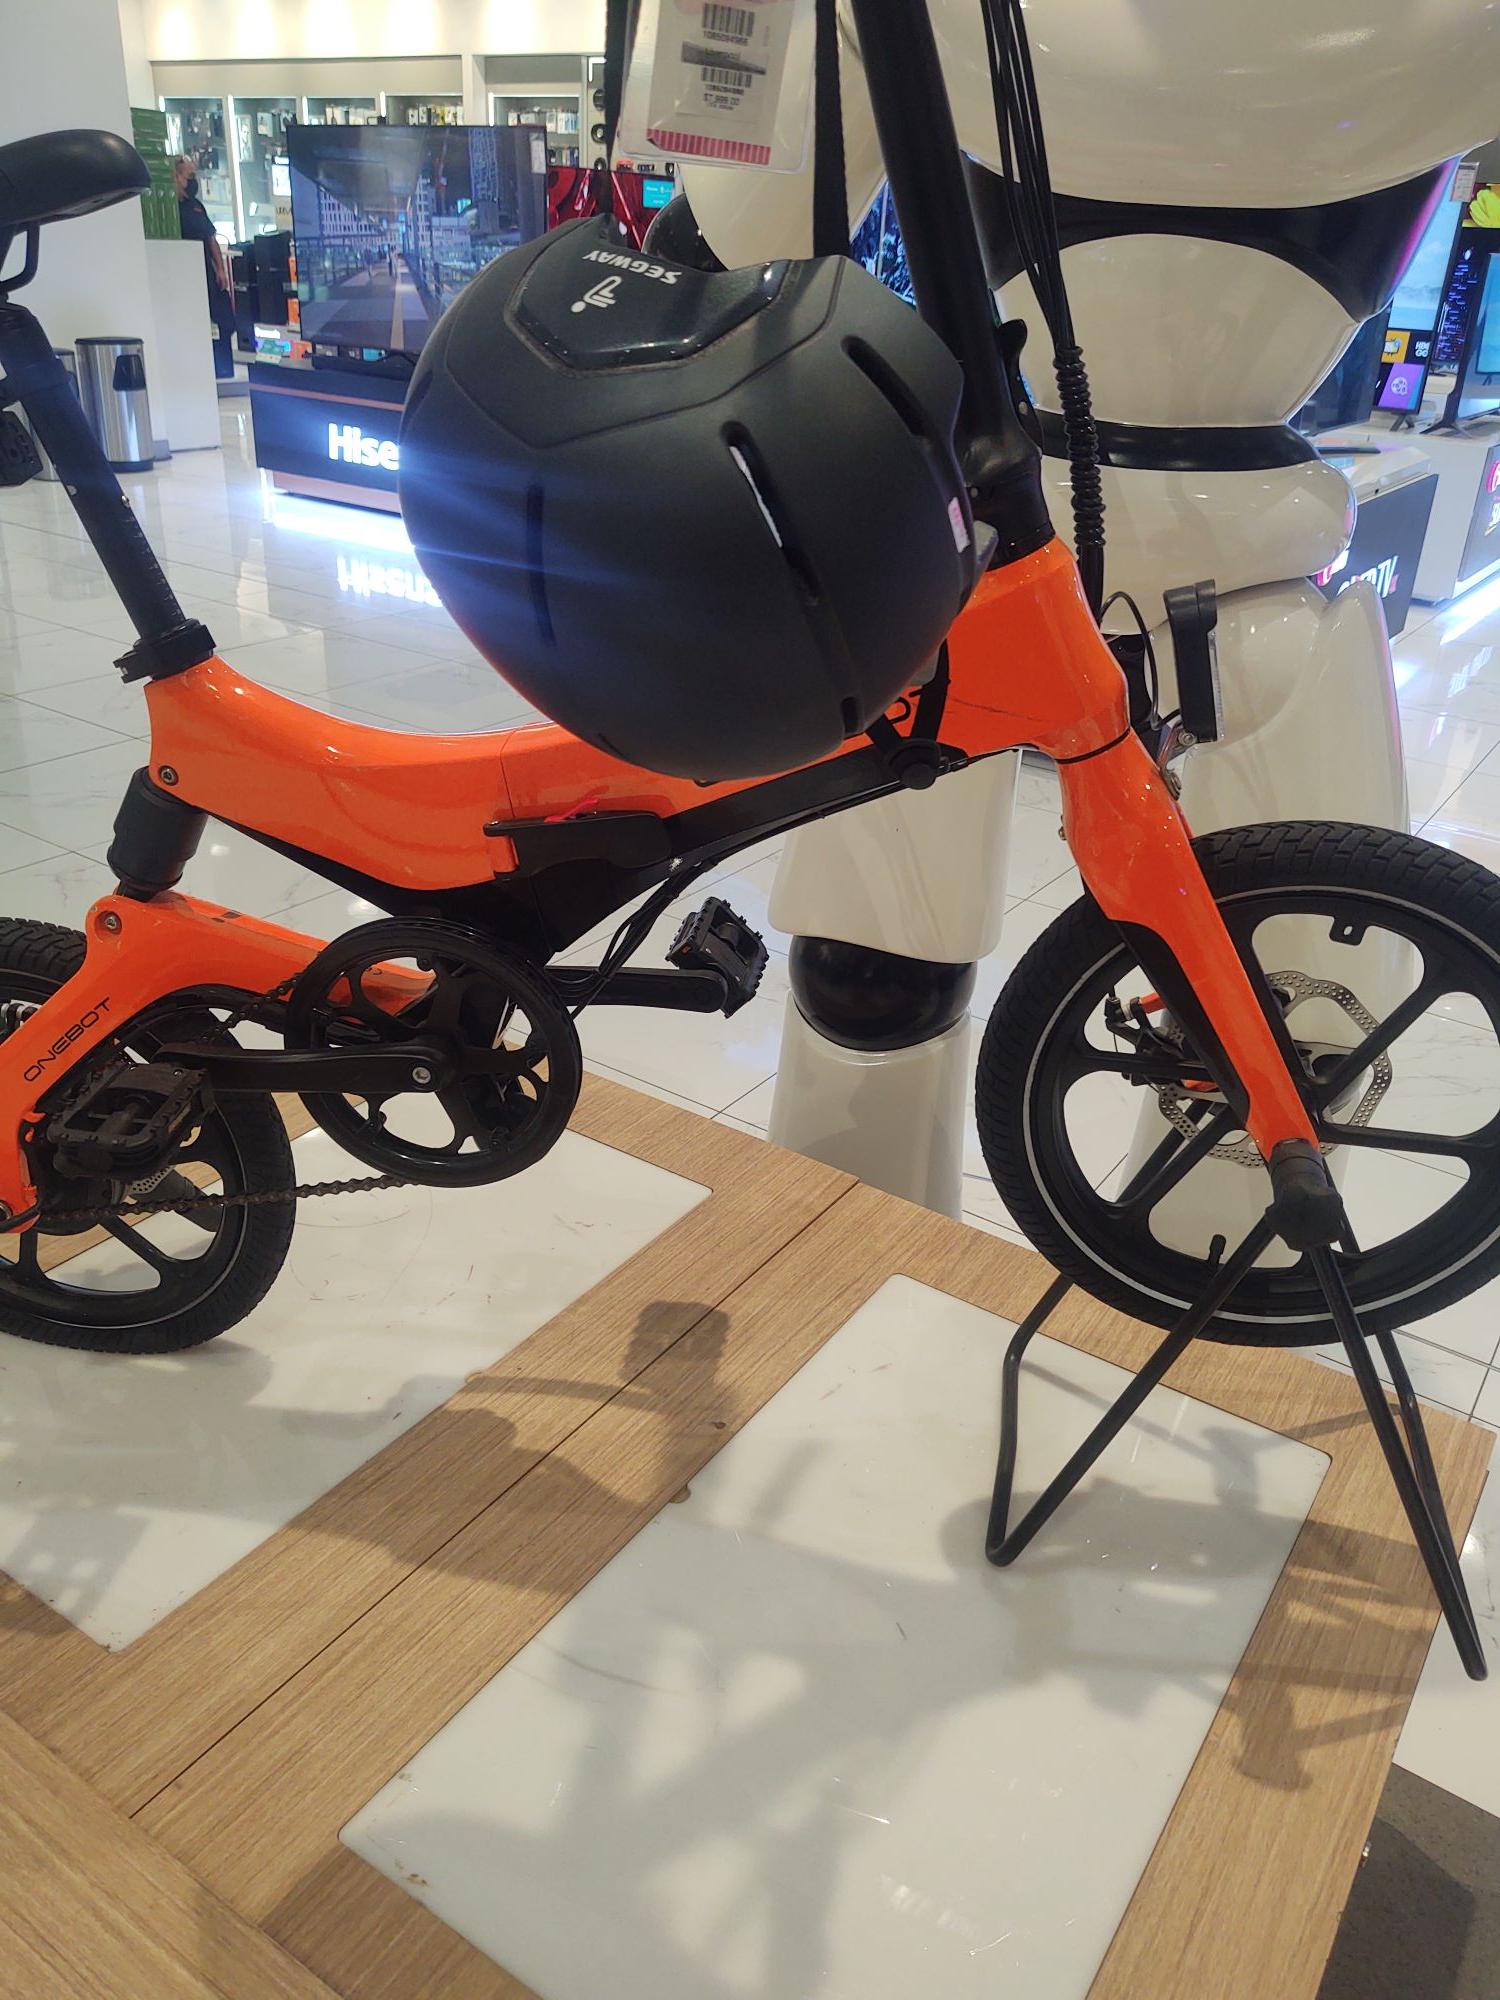 Liverpool Parque Puebla: Bicicleta eléctrica onebot S6